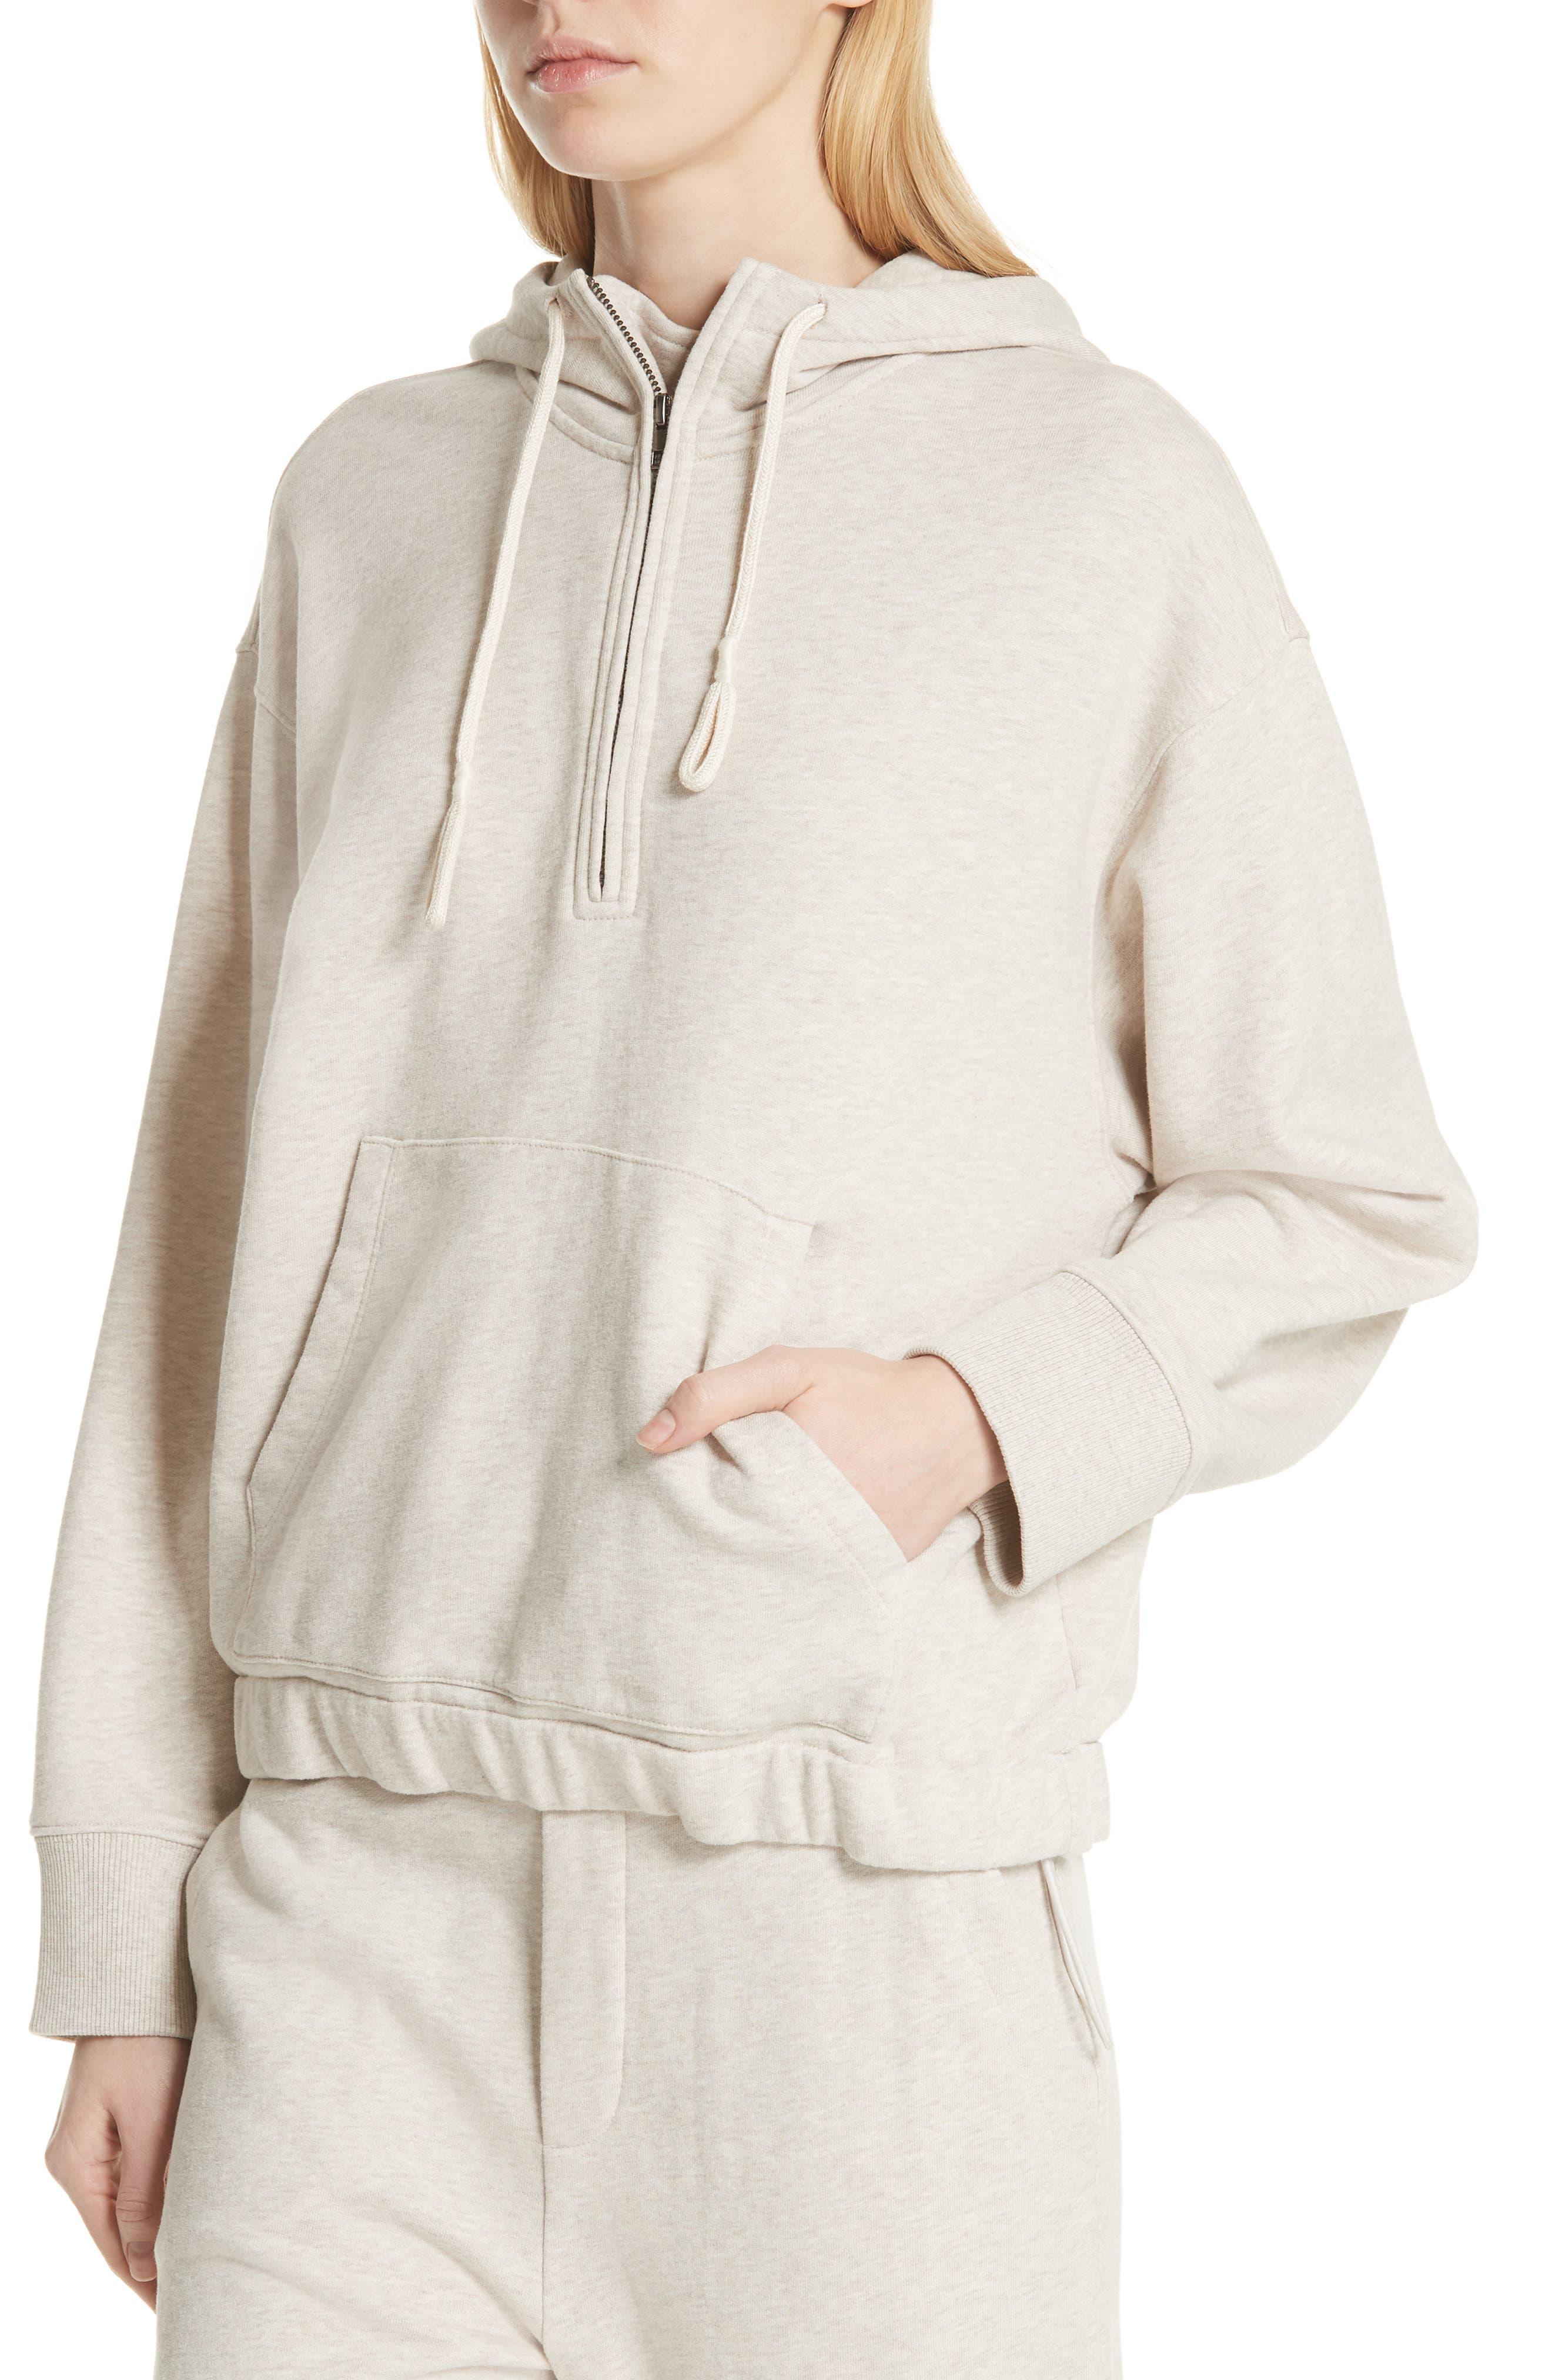 Half Zip Cotton Hoodie Sweatshirt,                             Alternate thumbnail 4, color,                             255